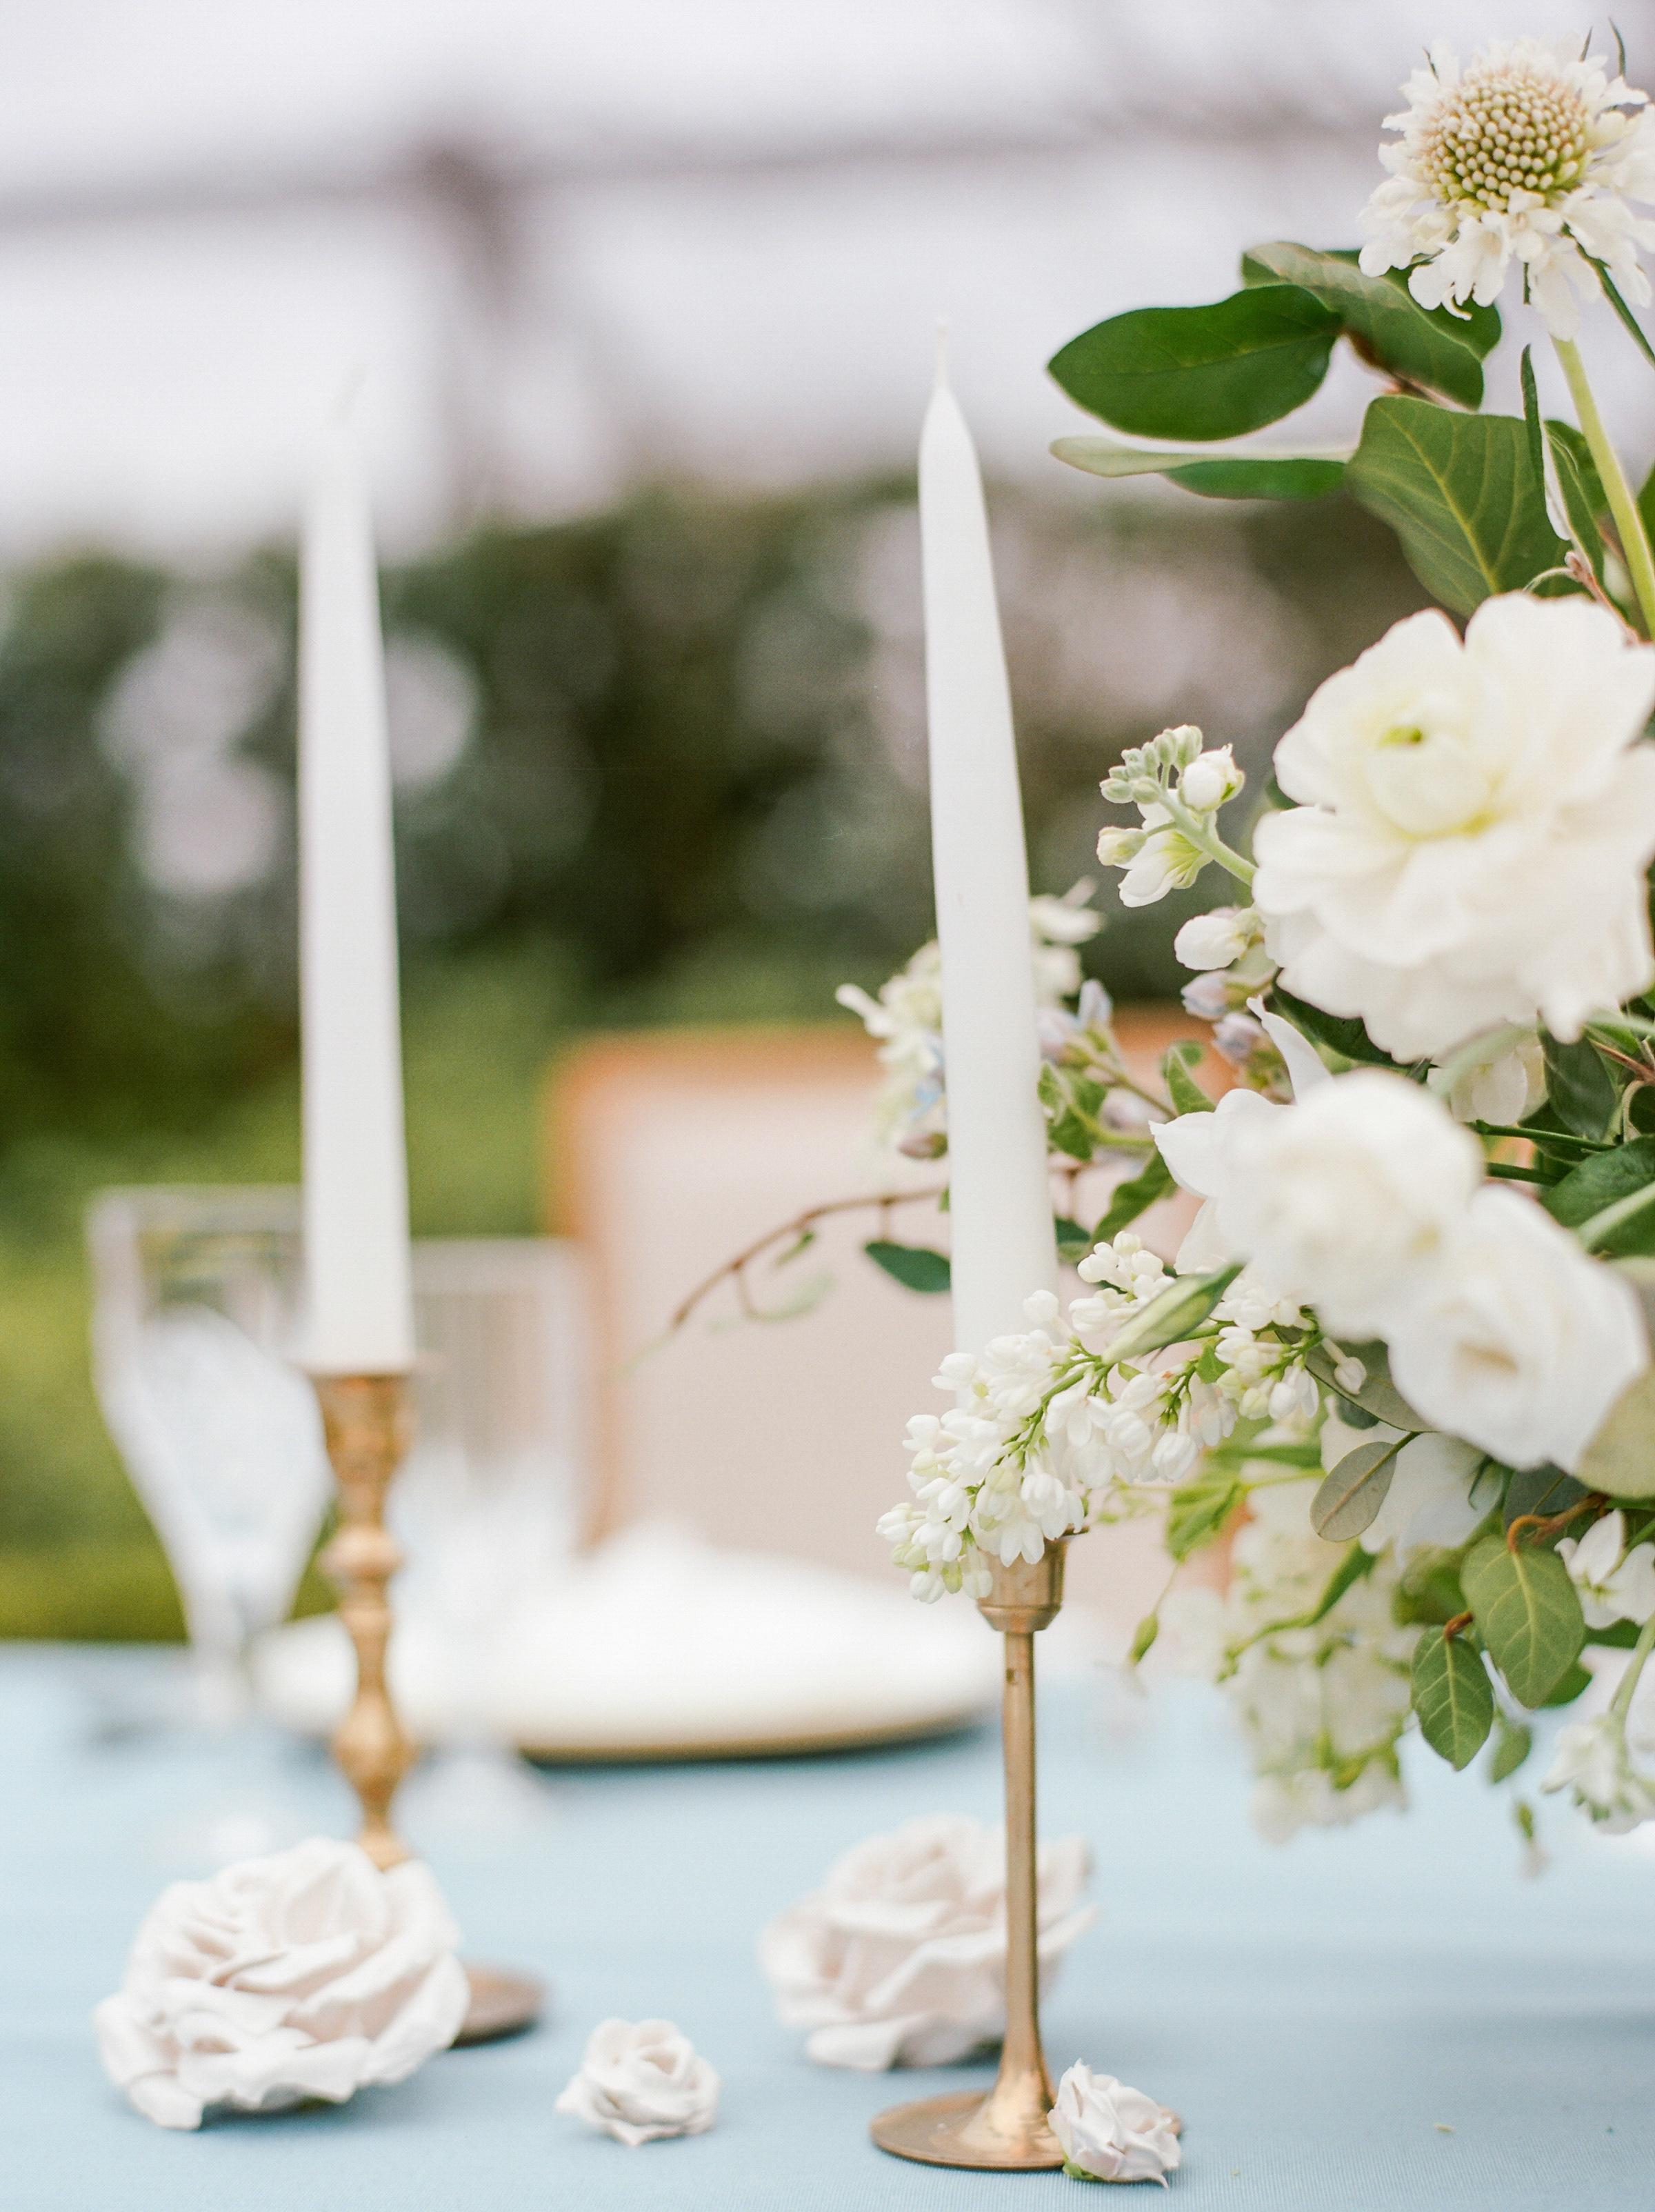 McGovern-Centennial-Gardens-Houston-Texas-Wedding-Venue-Josh-Dana-Fernandez-Photography-Film-Destination-Fine-Art-Luxury-Top-Best-Austin-Dallas-Magnolia-Rouge-Jennifer-Laura-Design-15.jpg